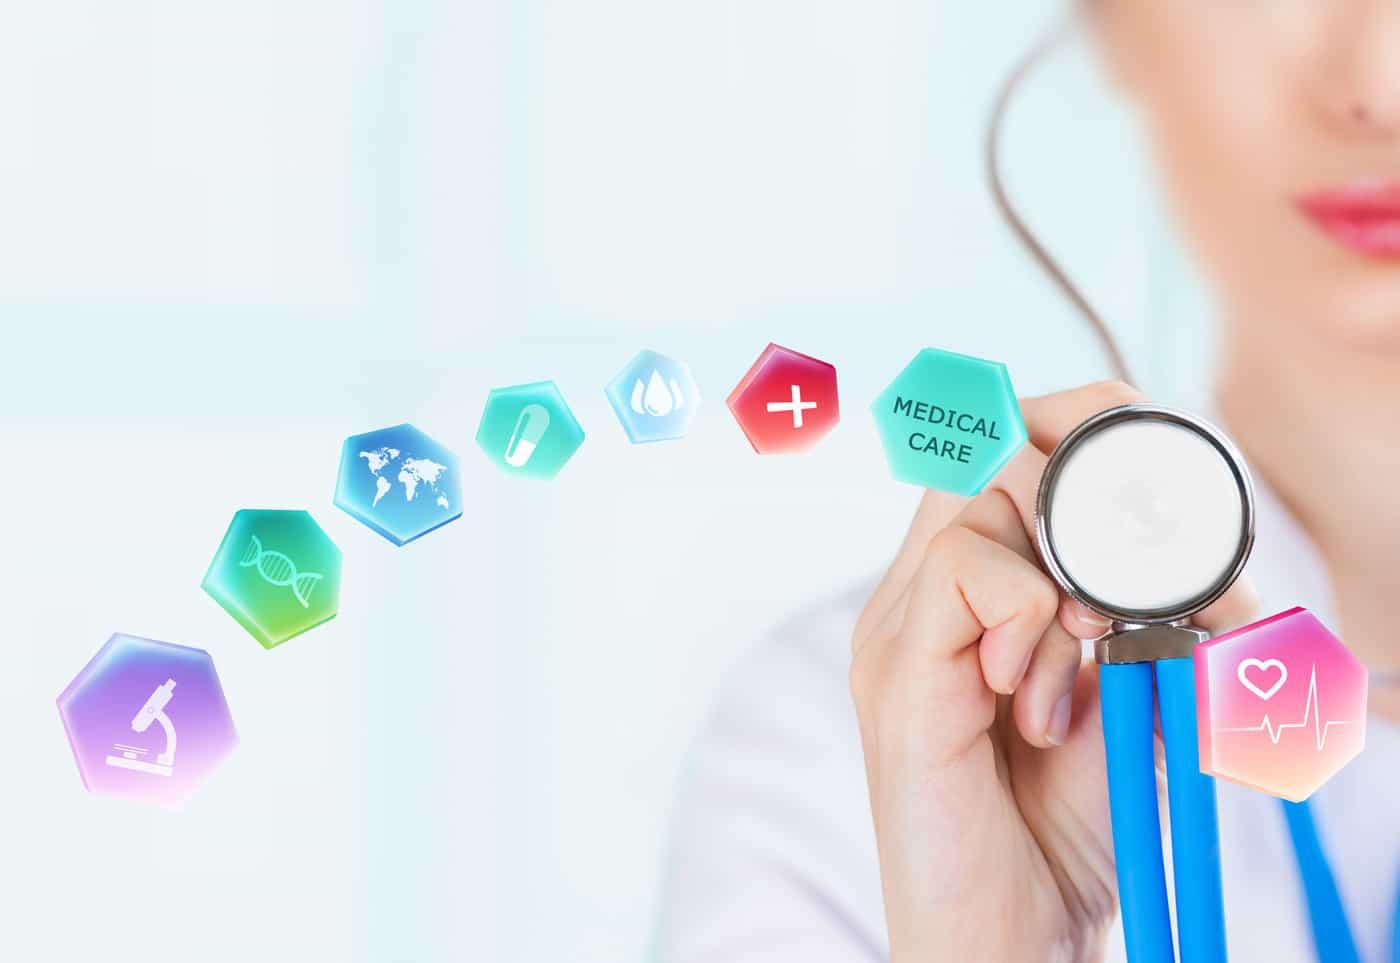 linkendin summary for pharmacovigilance